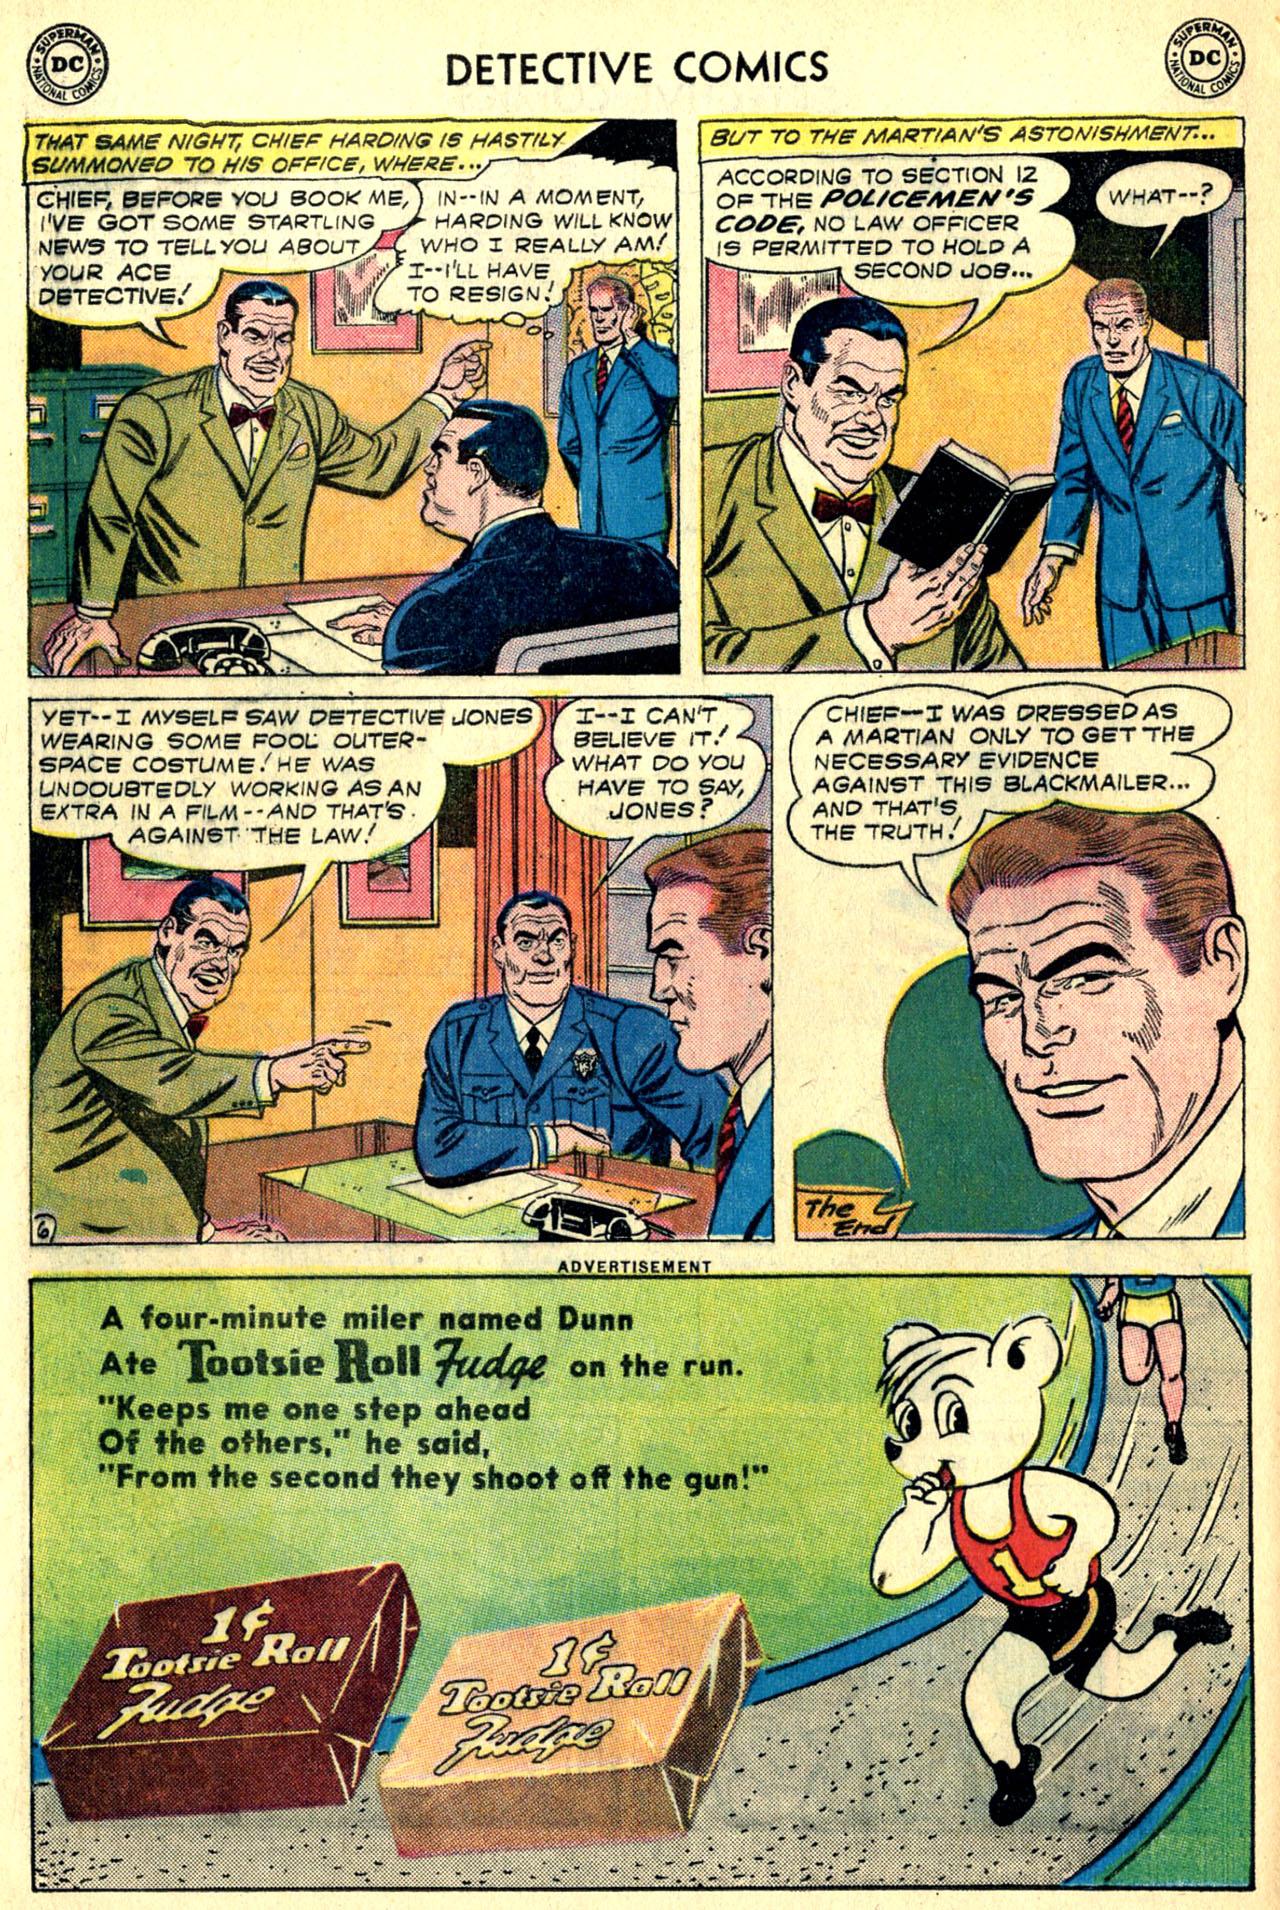 Detective Comics (1937) 269 Page 31